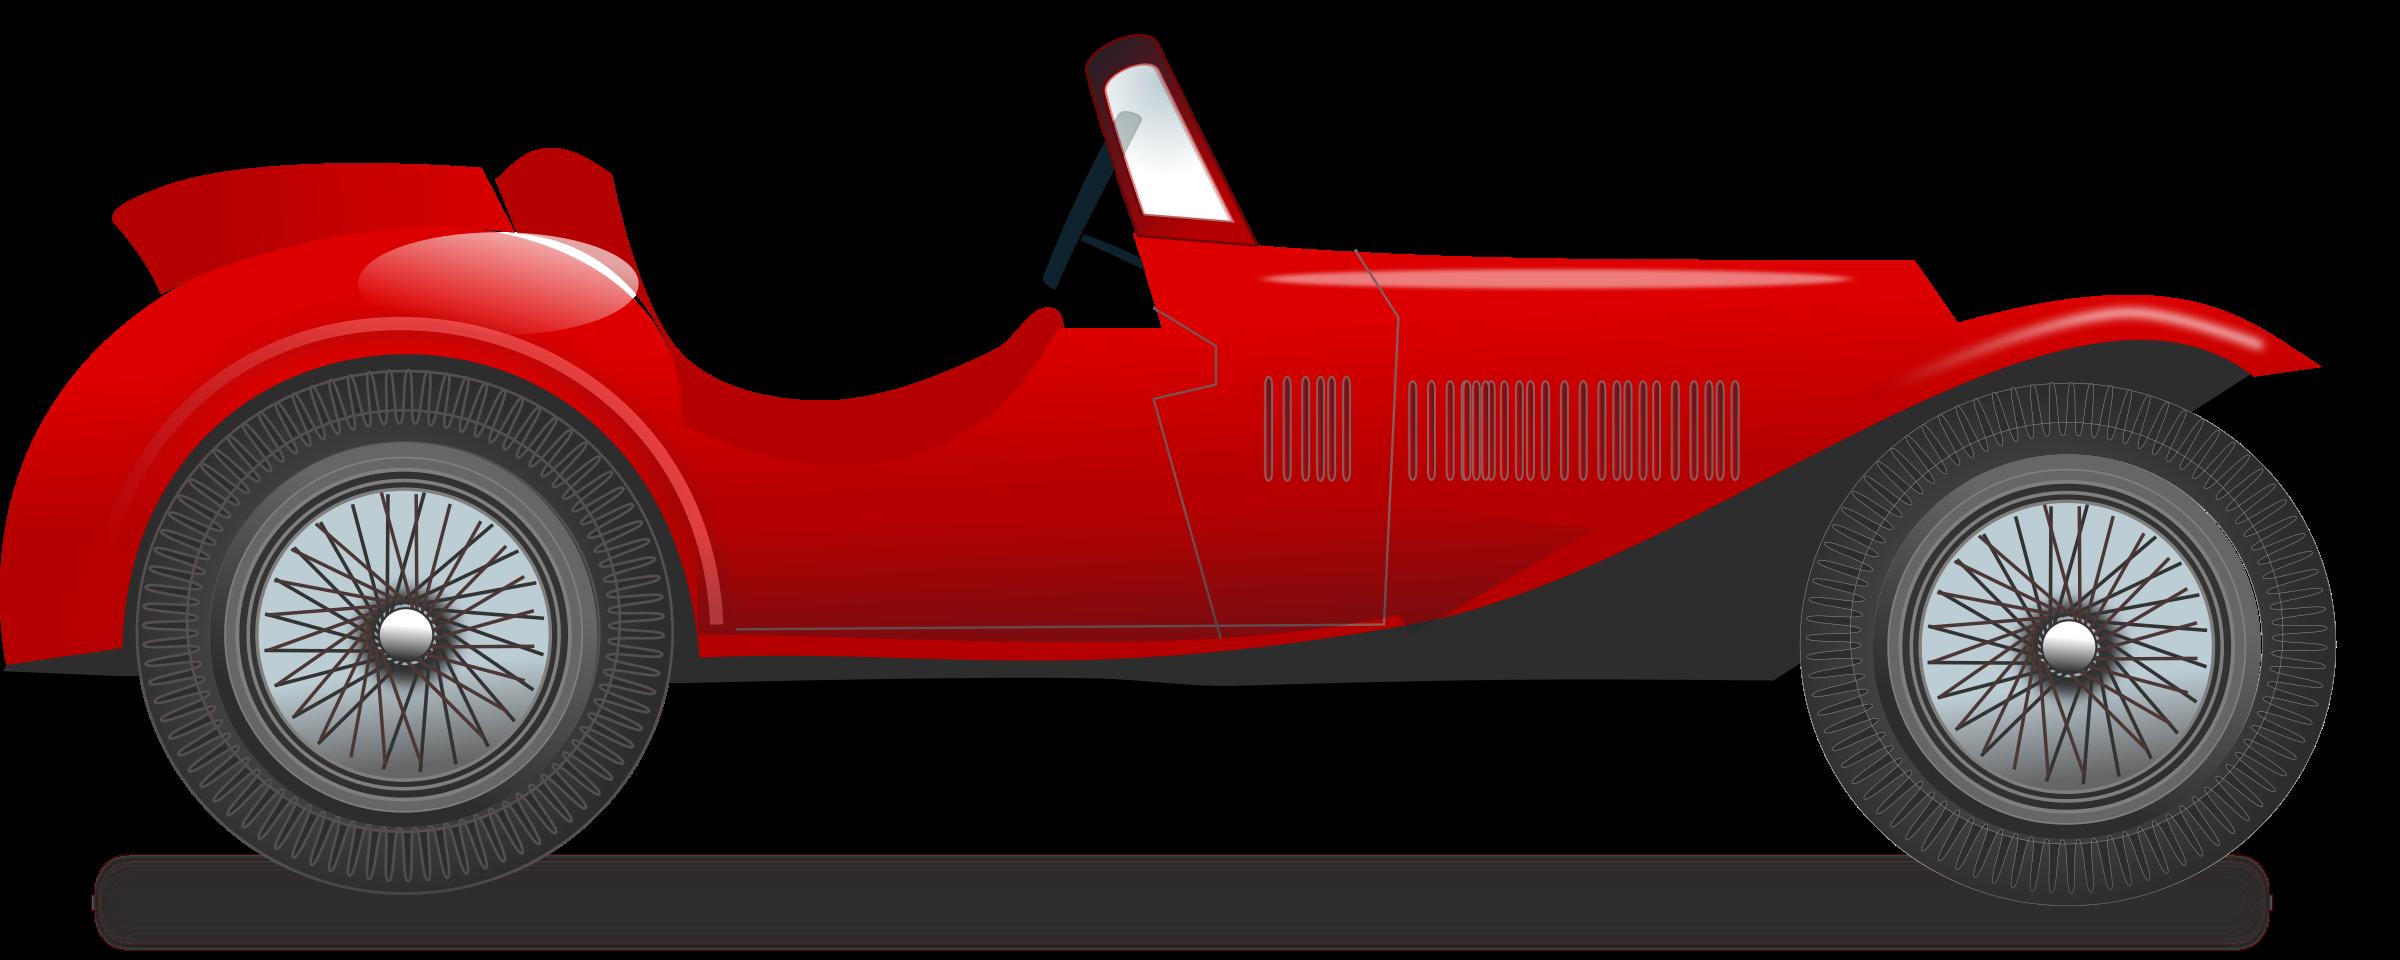 2400x960 Classic Car Clipart Racing Car